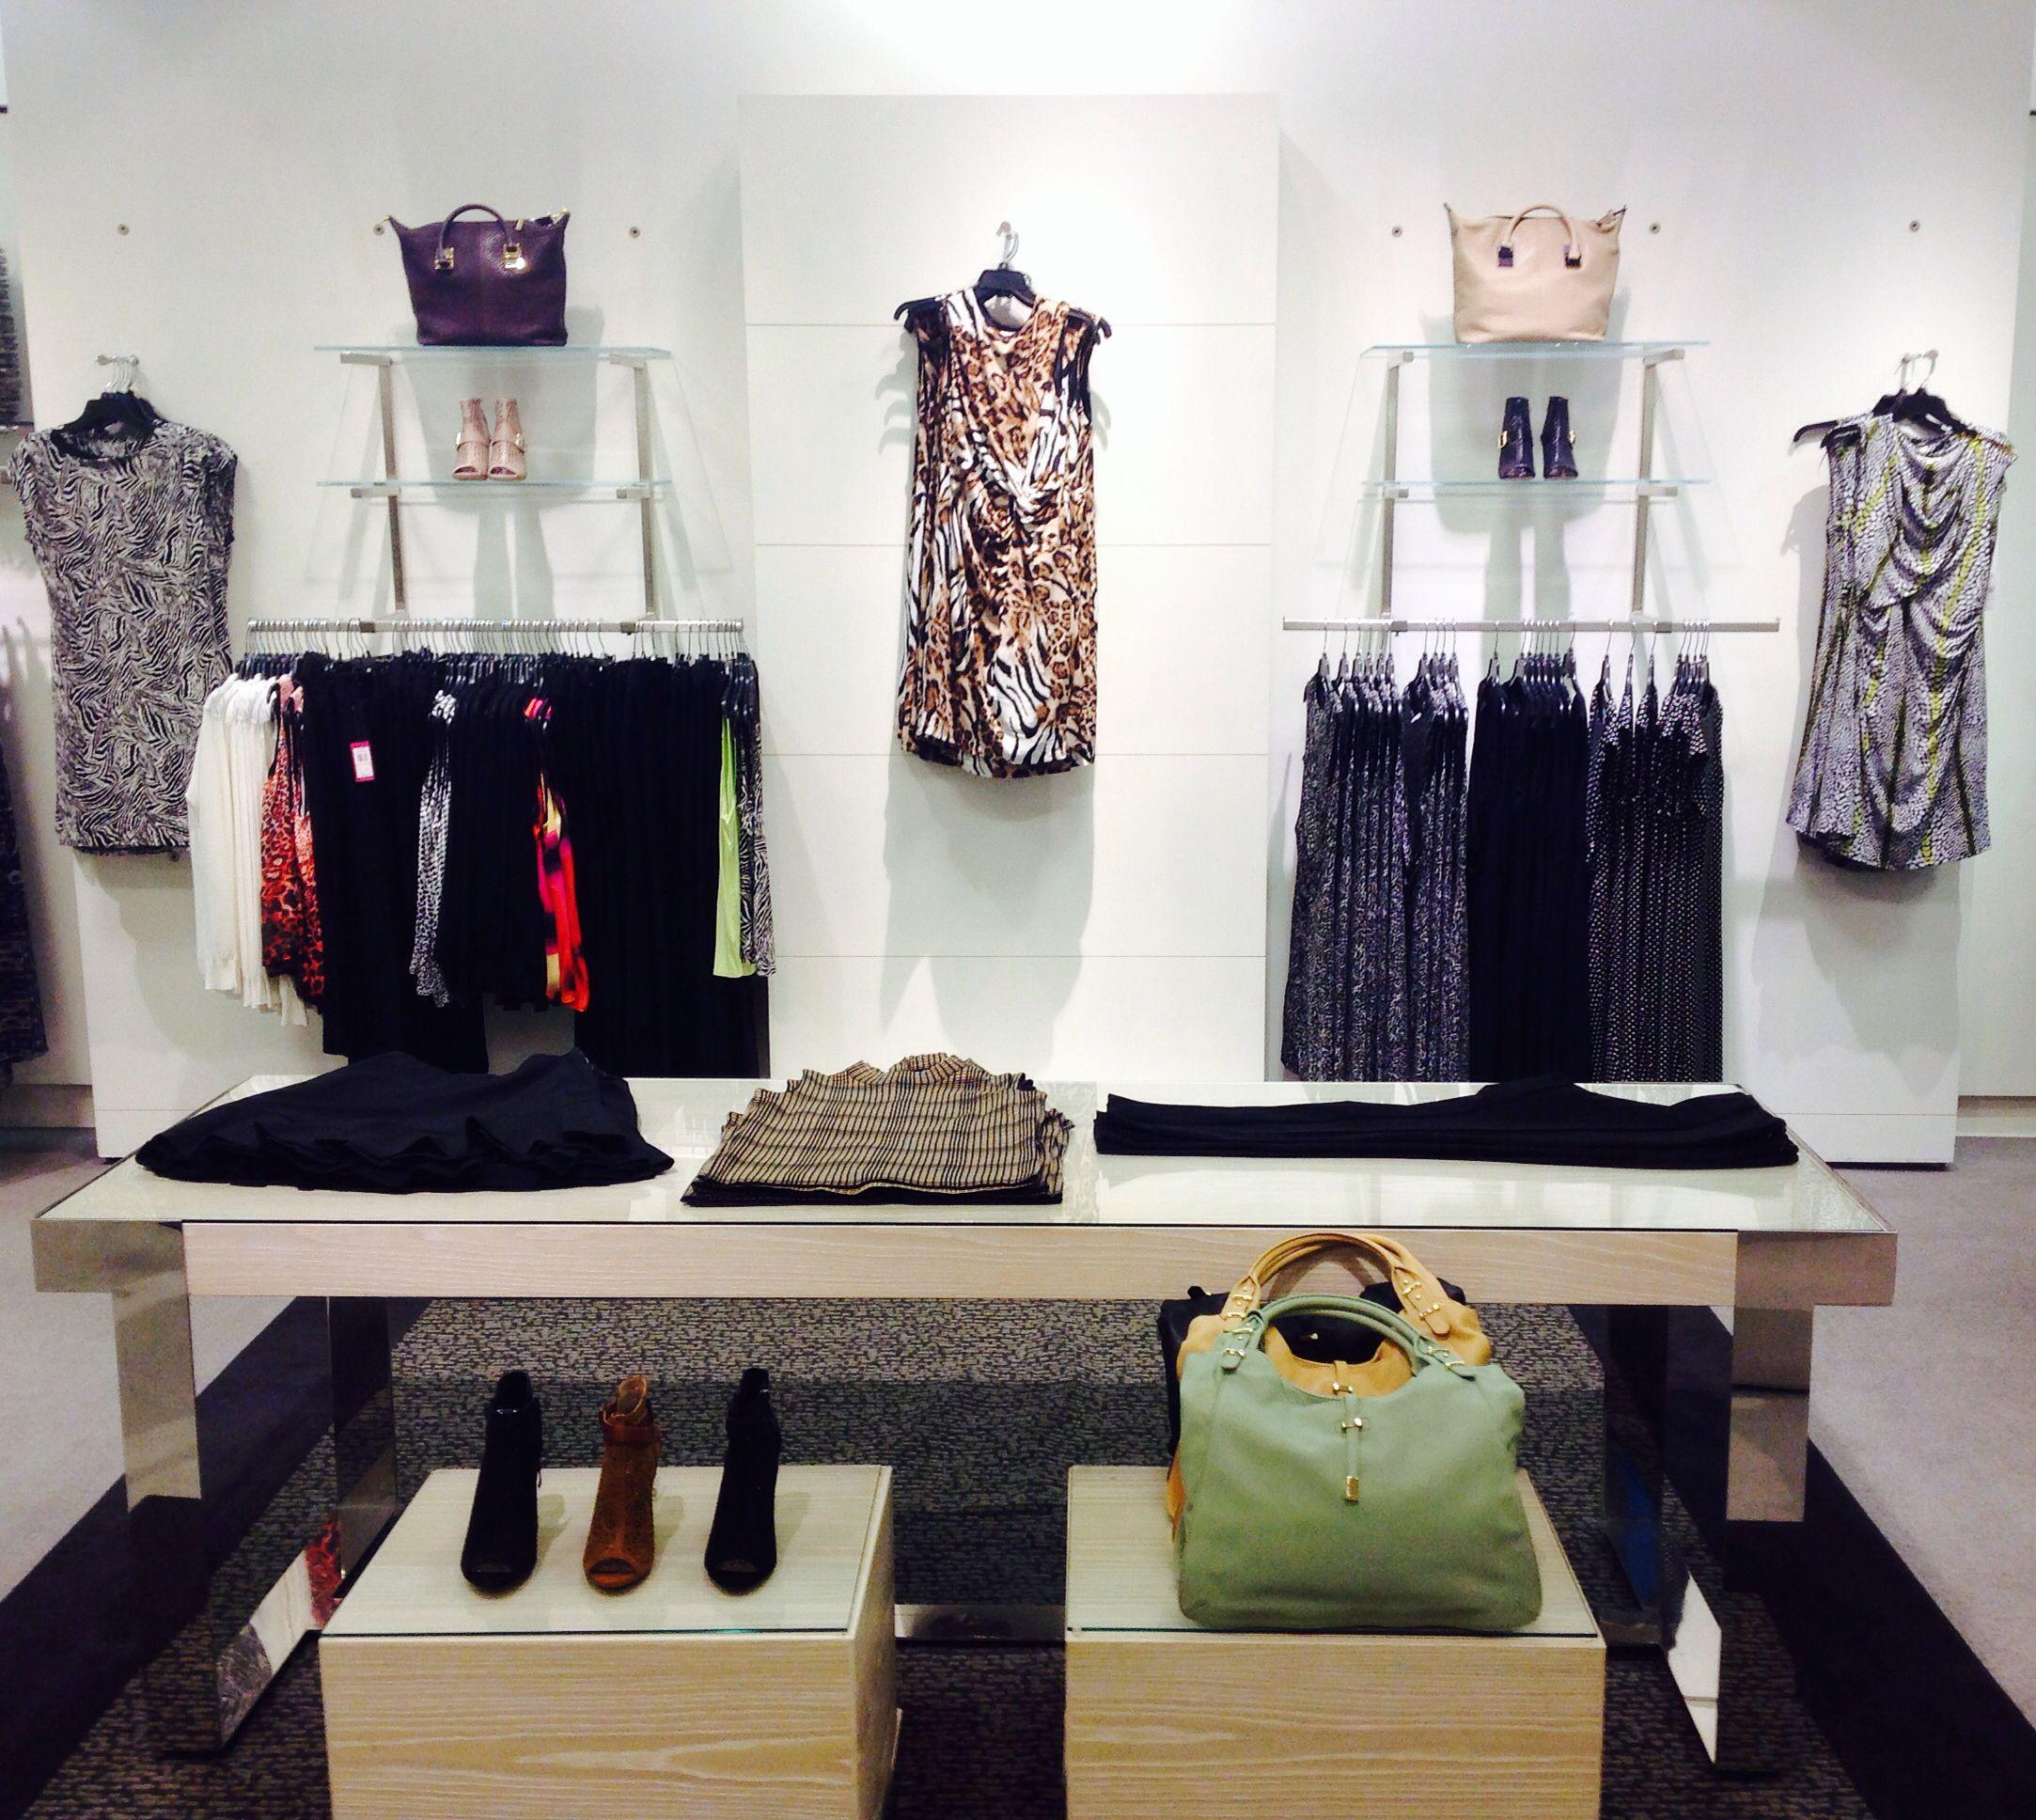 Vince Camuto With Cross Merchandising 8 14 Wardrobe Rack Home Decor Decor